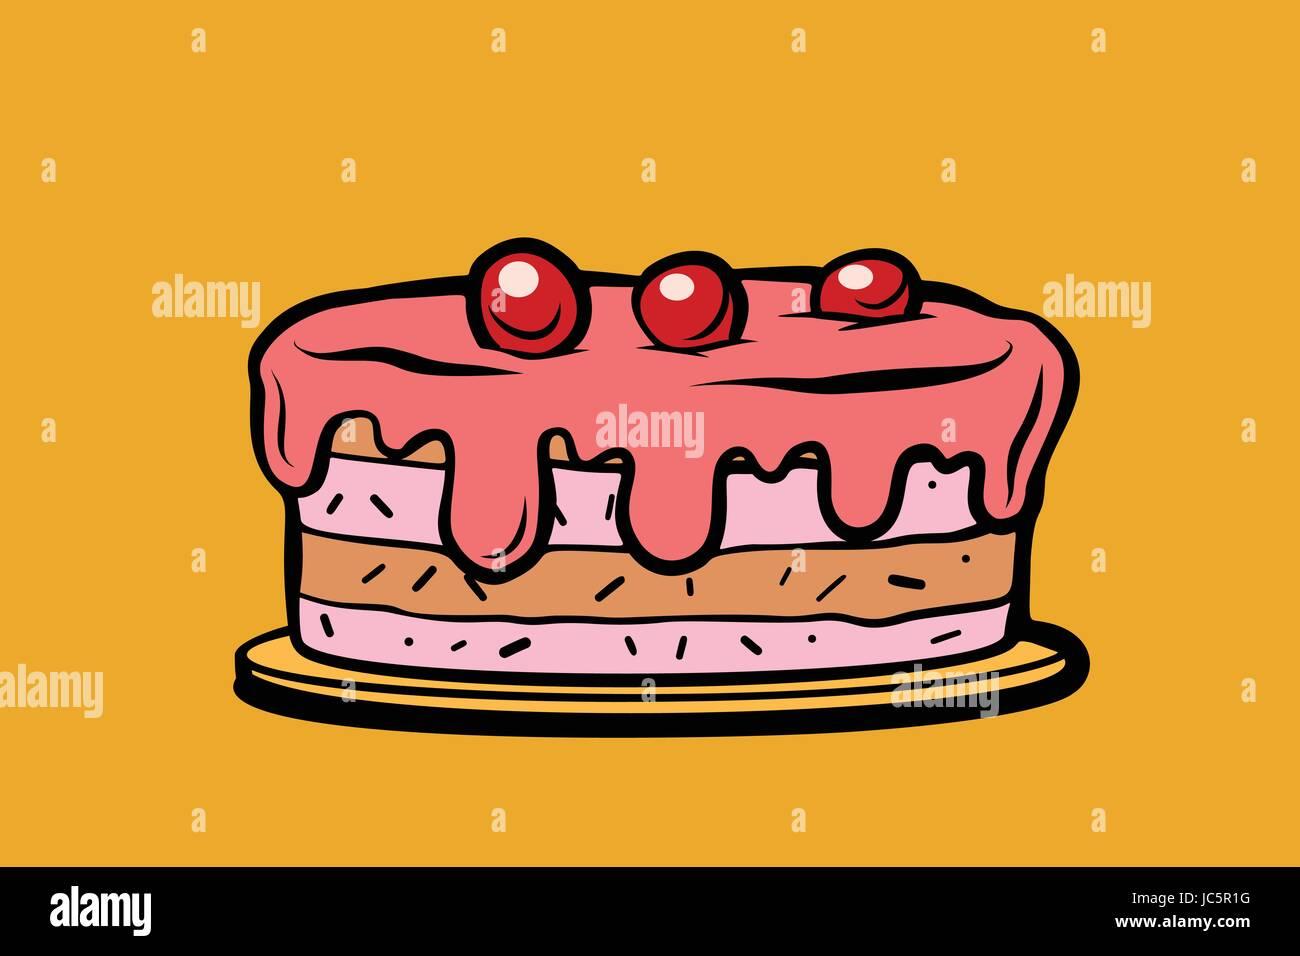 cherry berry cake  Comic cartoon style pop art retro vector